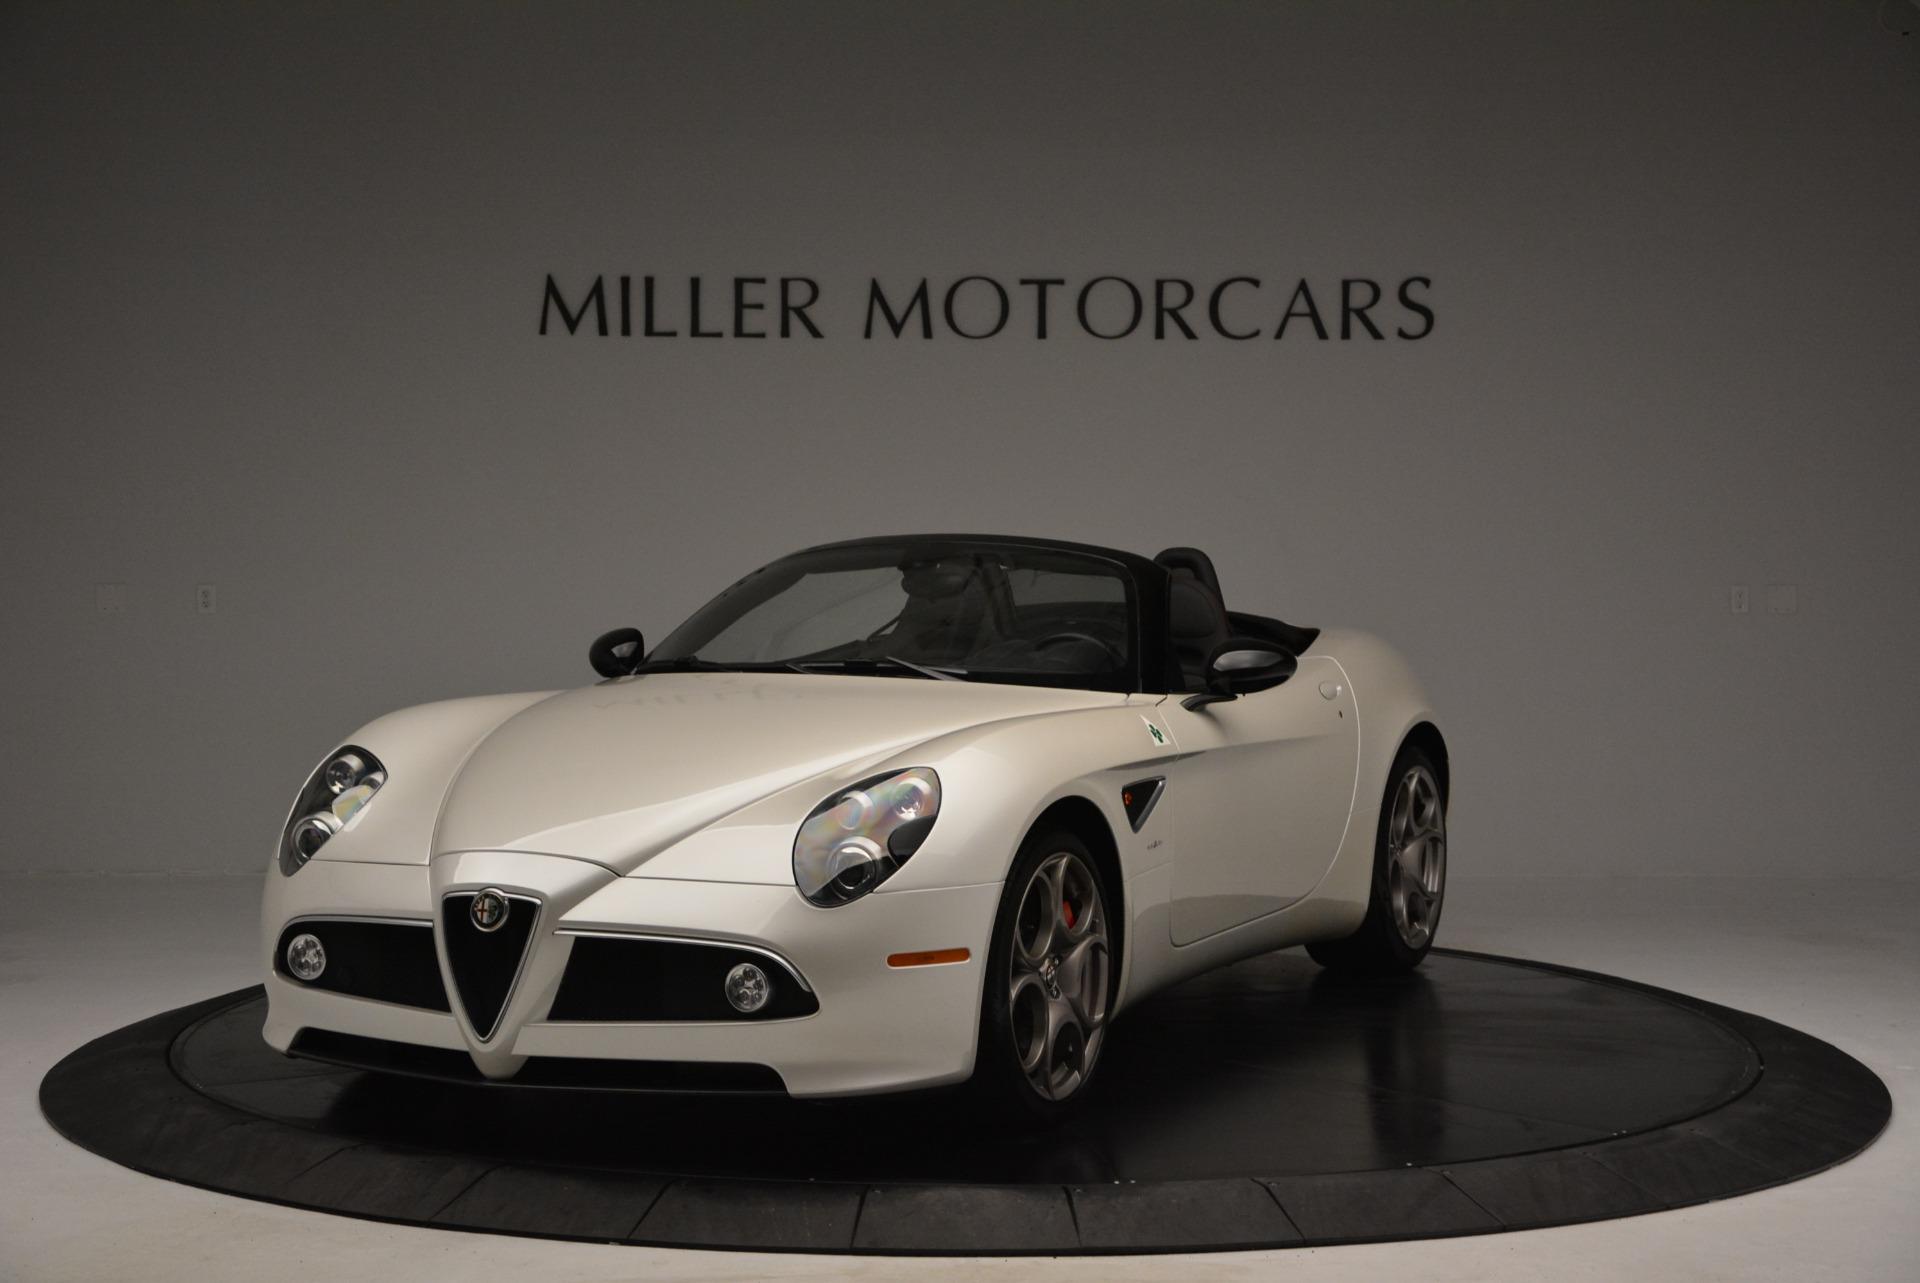 Used 2009 Alfa Romeo 8C Competizione Spider for sale $345,900 at Maserati of Westport in Westport CT 06880 1